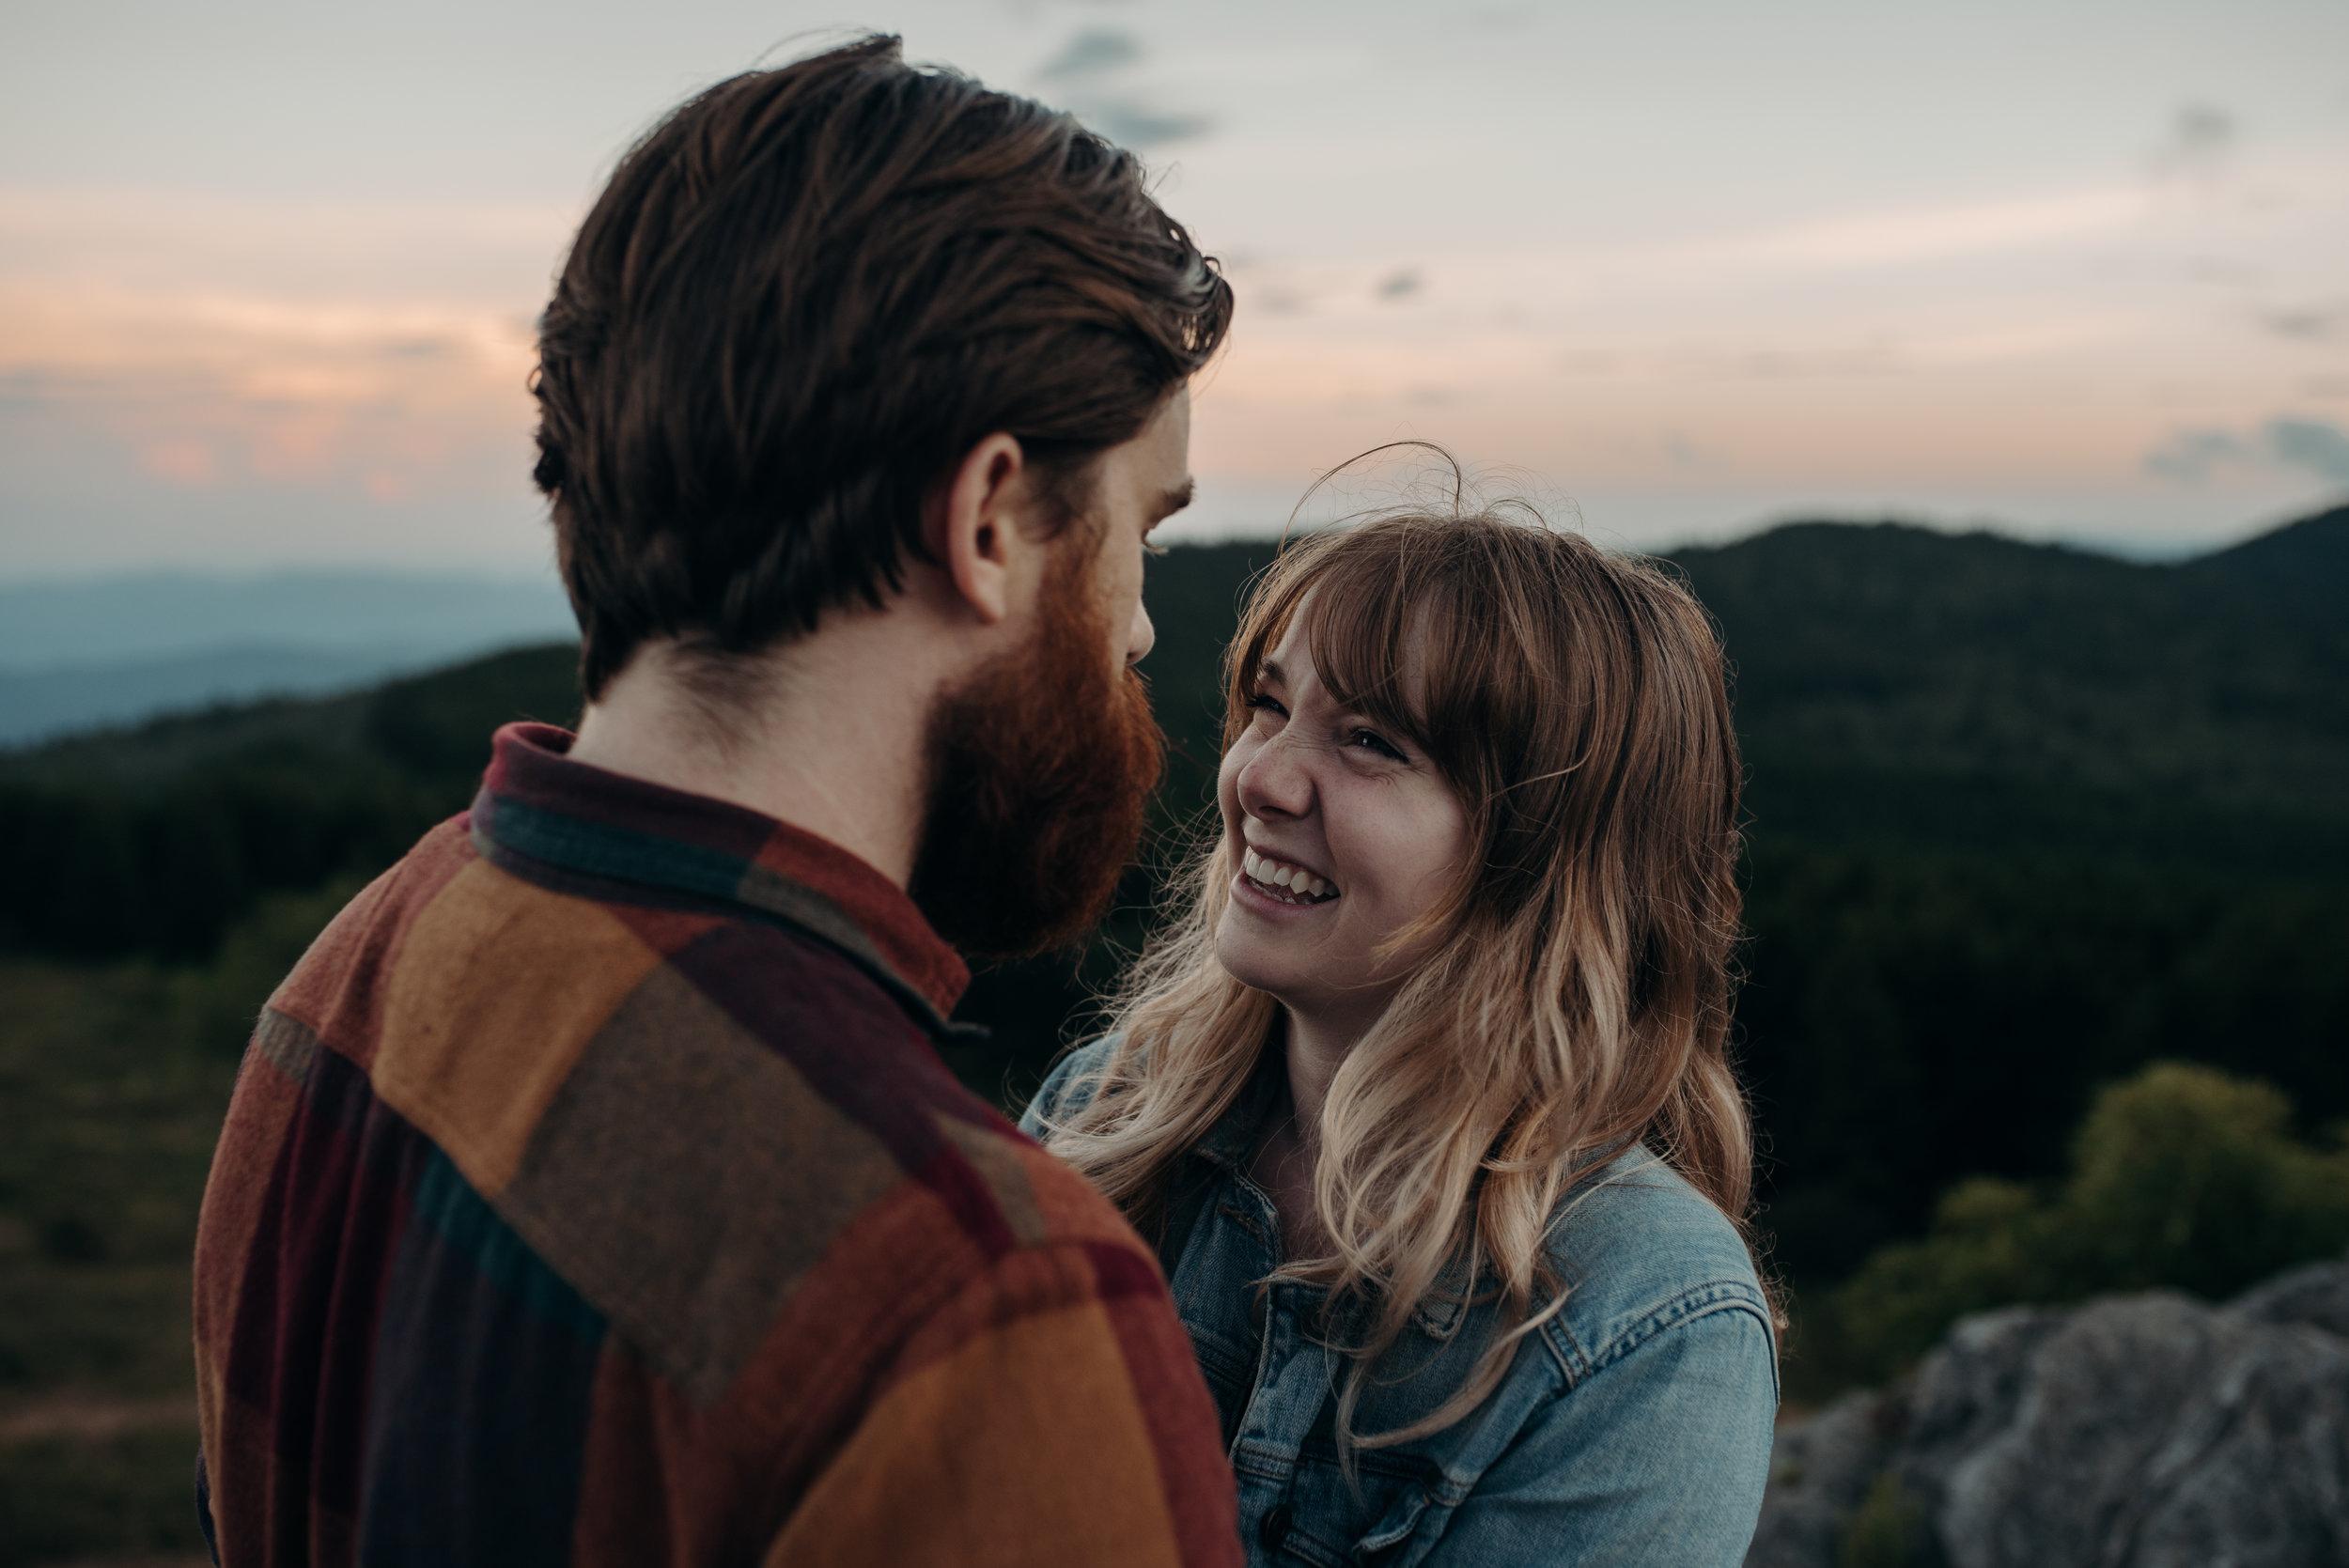 leah-joe-middleton-asheville-north-carolina-couple-session-destination-elopement-photographer-fox-and-film-182.jpg